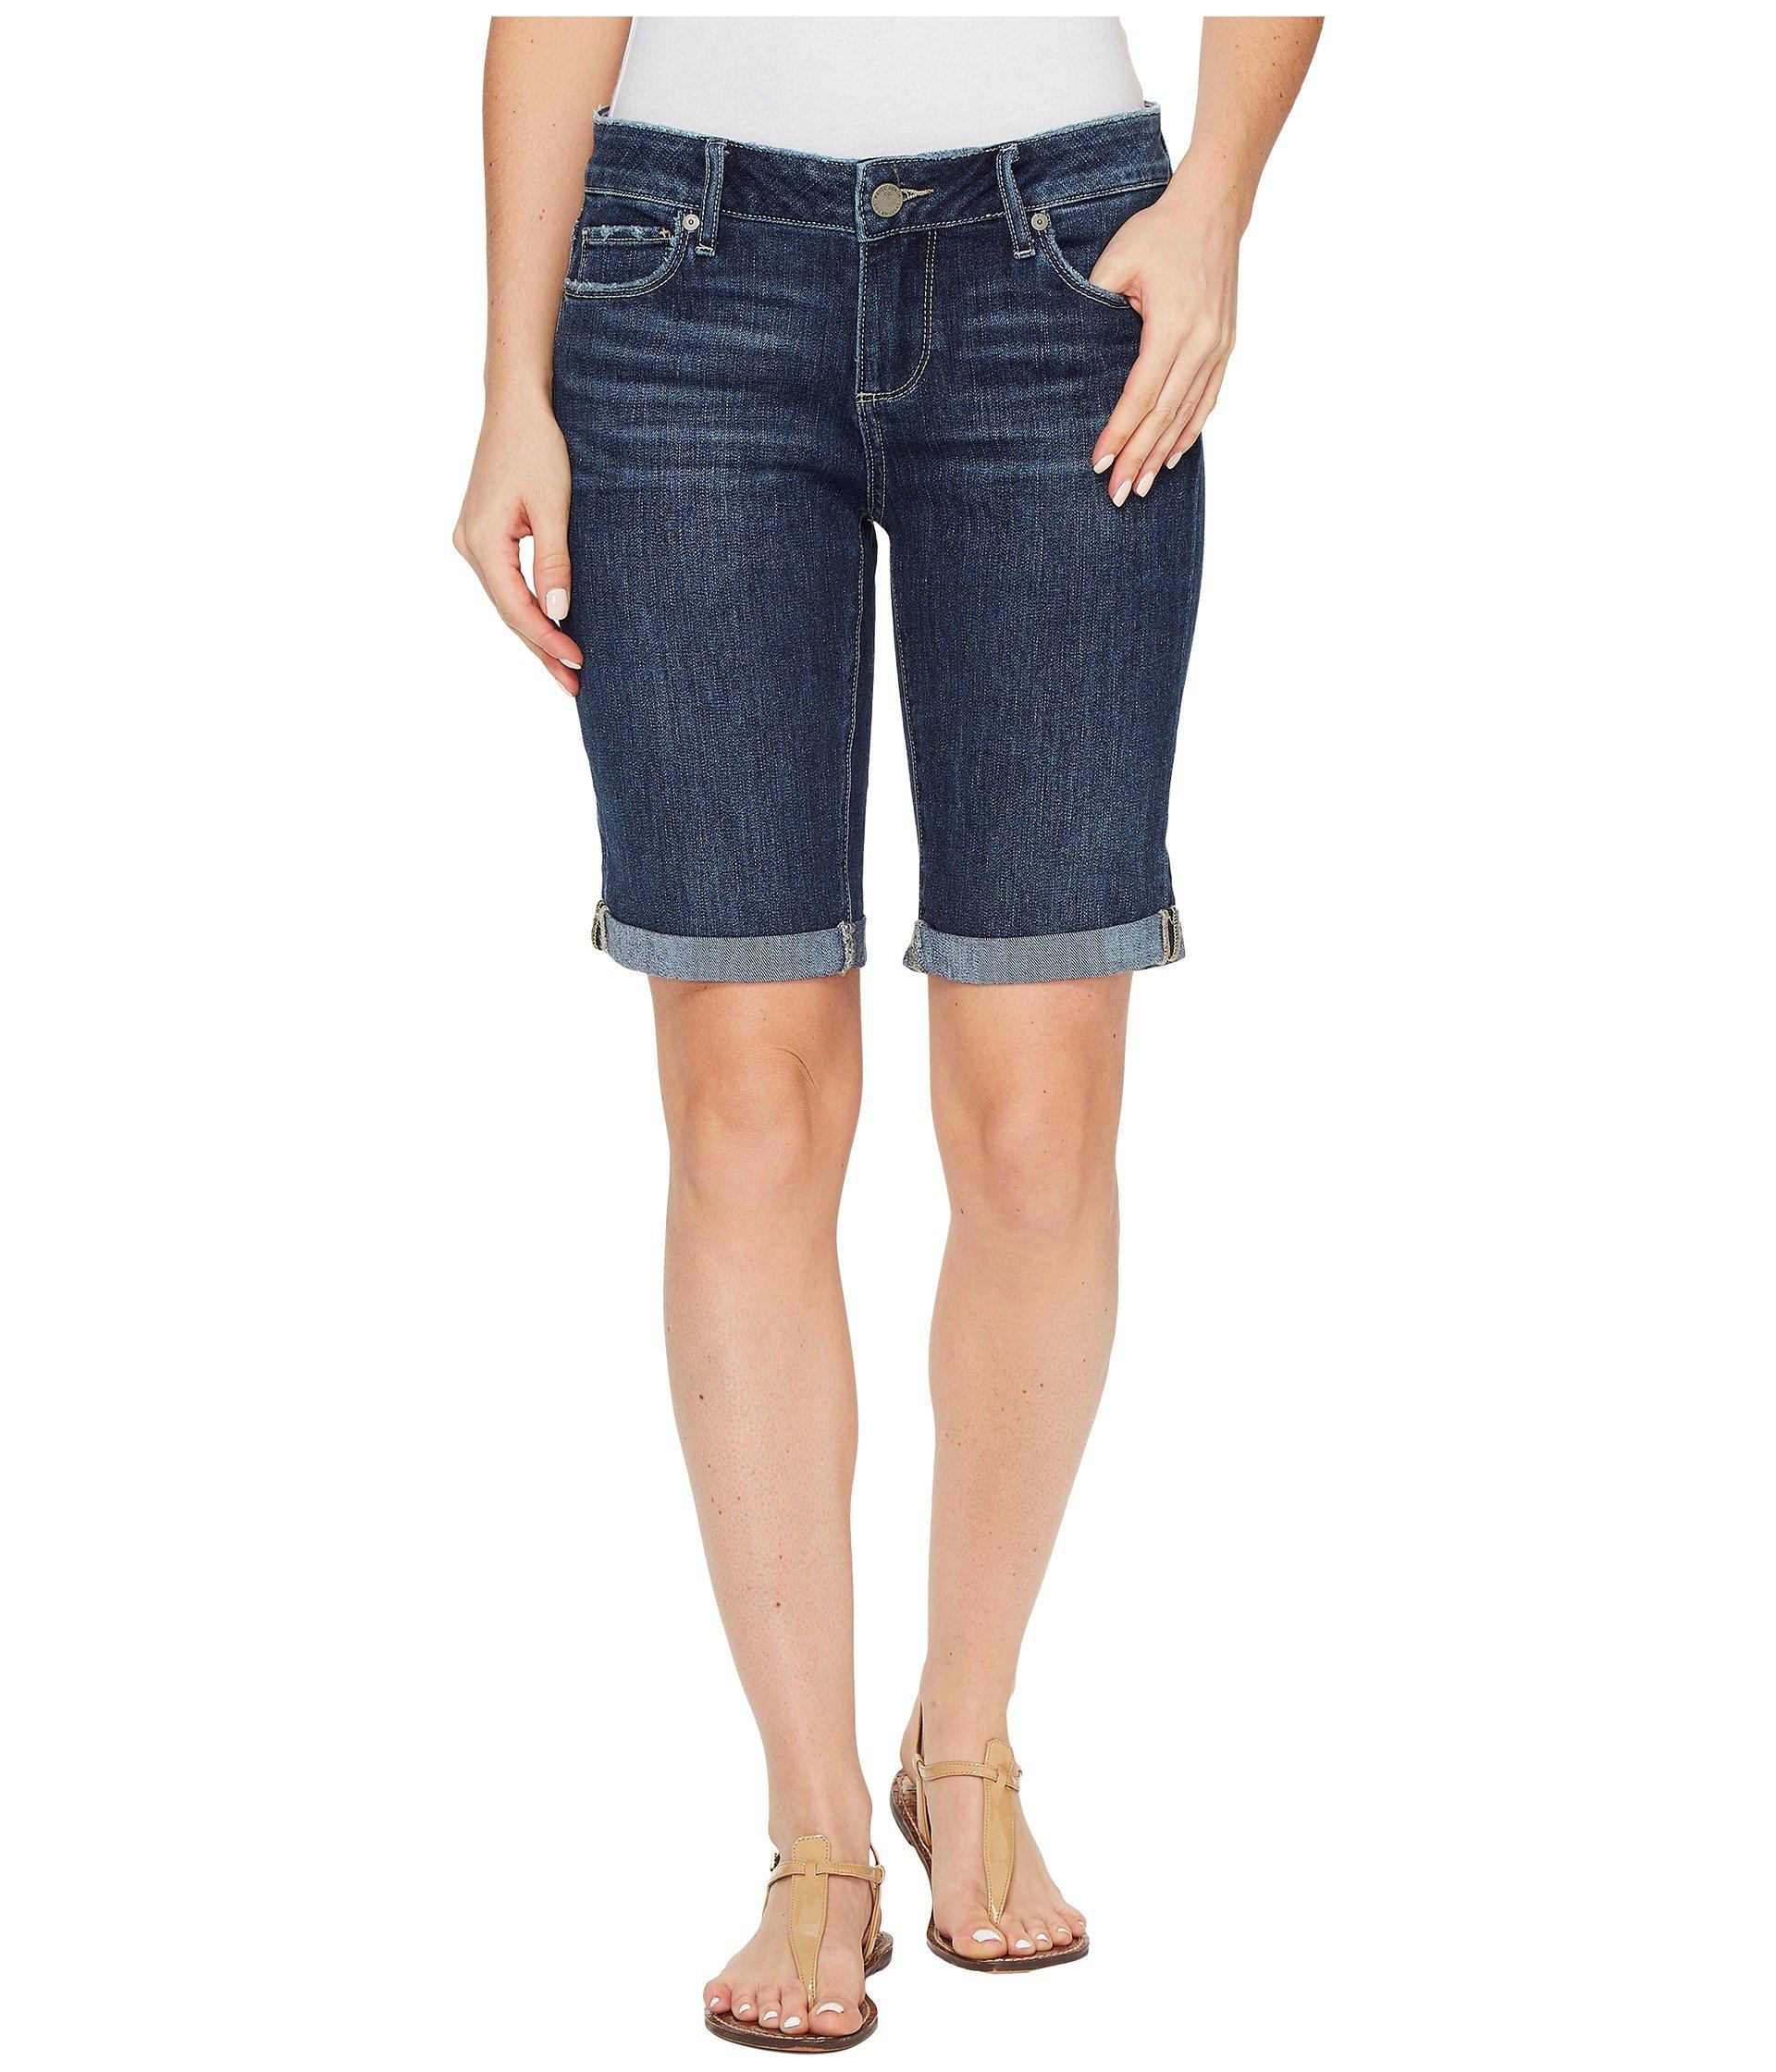 Jax Knee Shorts in Marquis